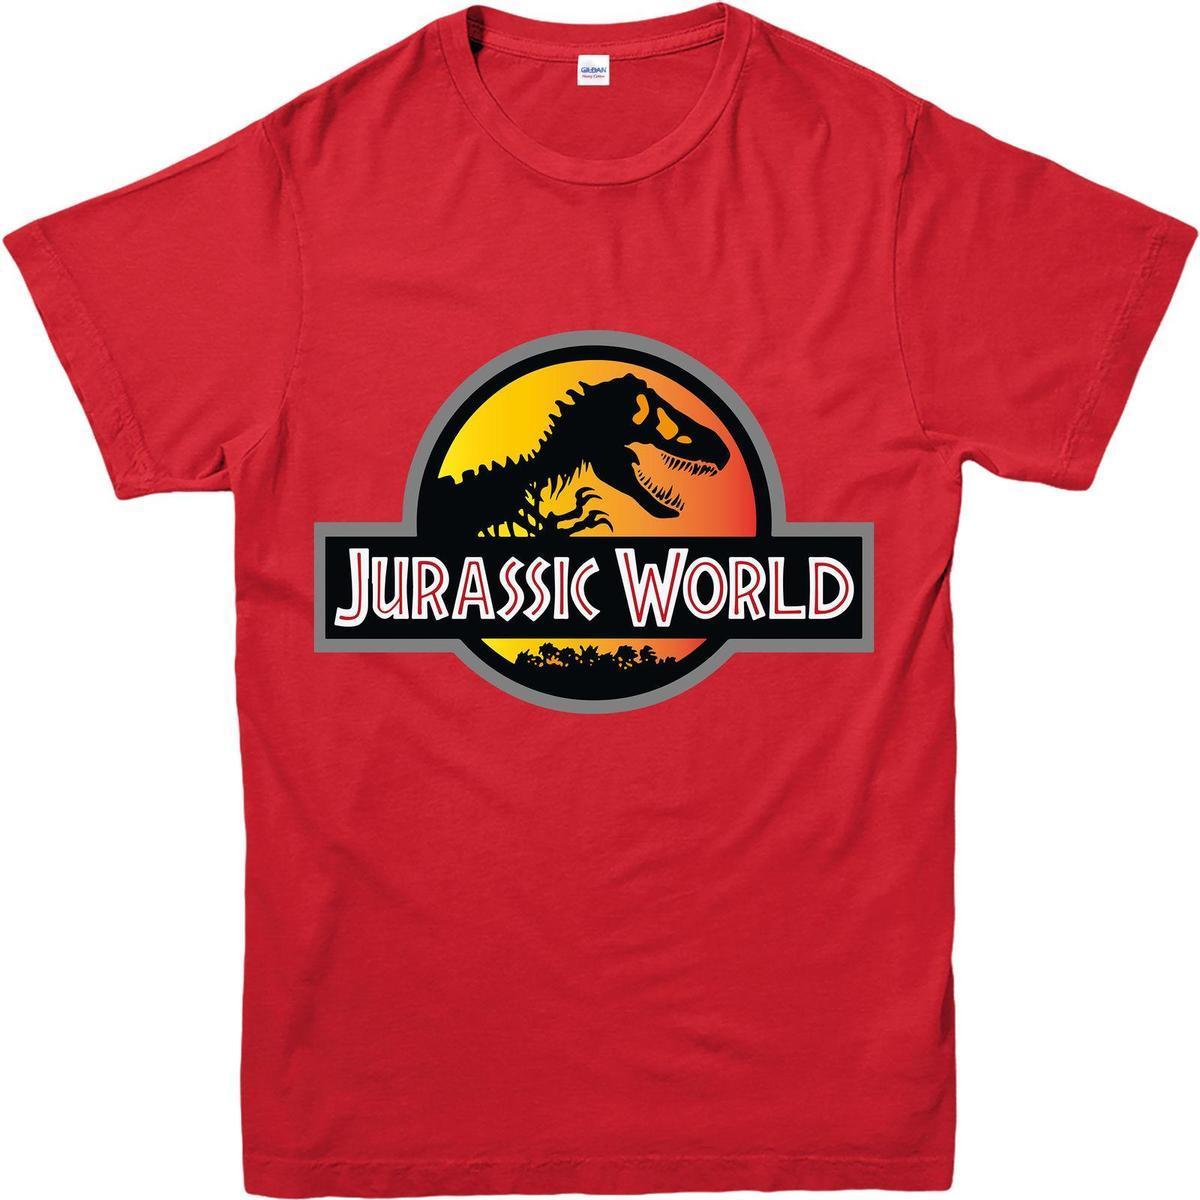 5a5bc9d6e3b Jurassic World T Shirt Movie Jurassic Park Logo T Shirt Dinosaur Ringer Tee  Shirts Online Cool Tee Shirts From Linnan00005